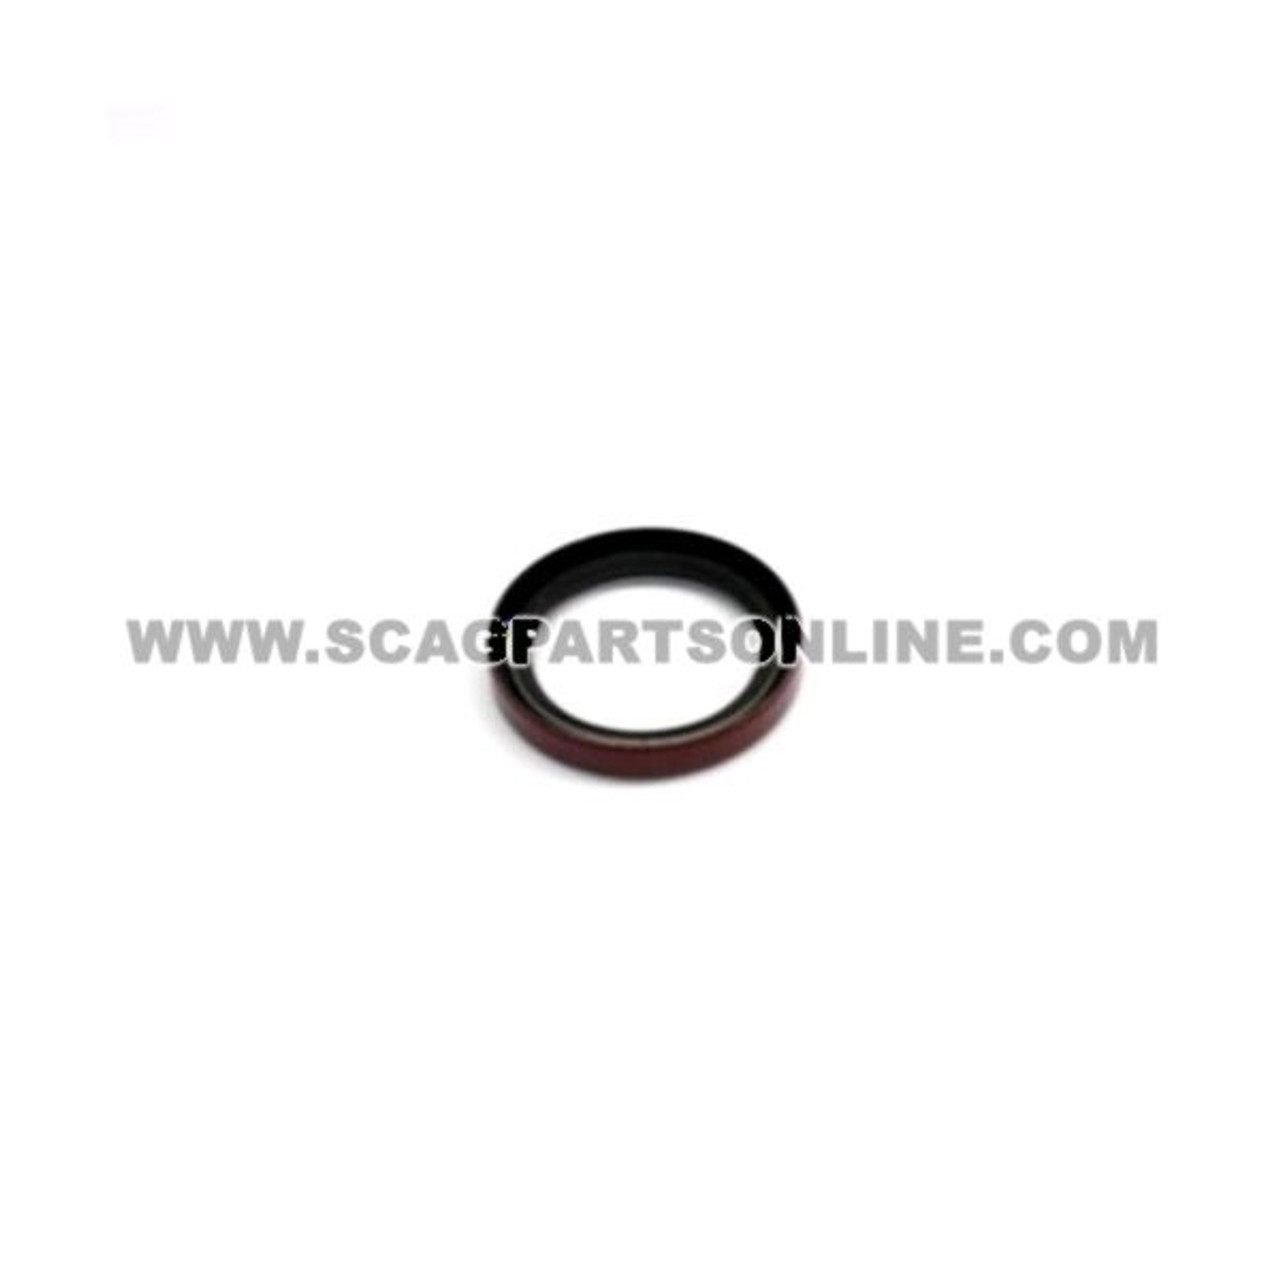 Scag SEAL, 2.00 OD X 1.50 BORE 481024 - Image 1